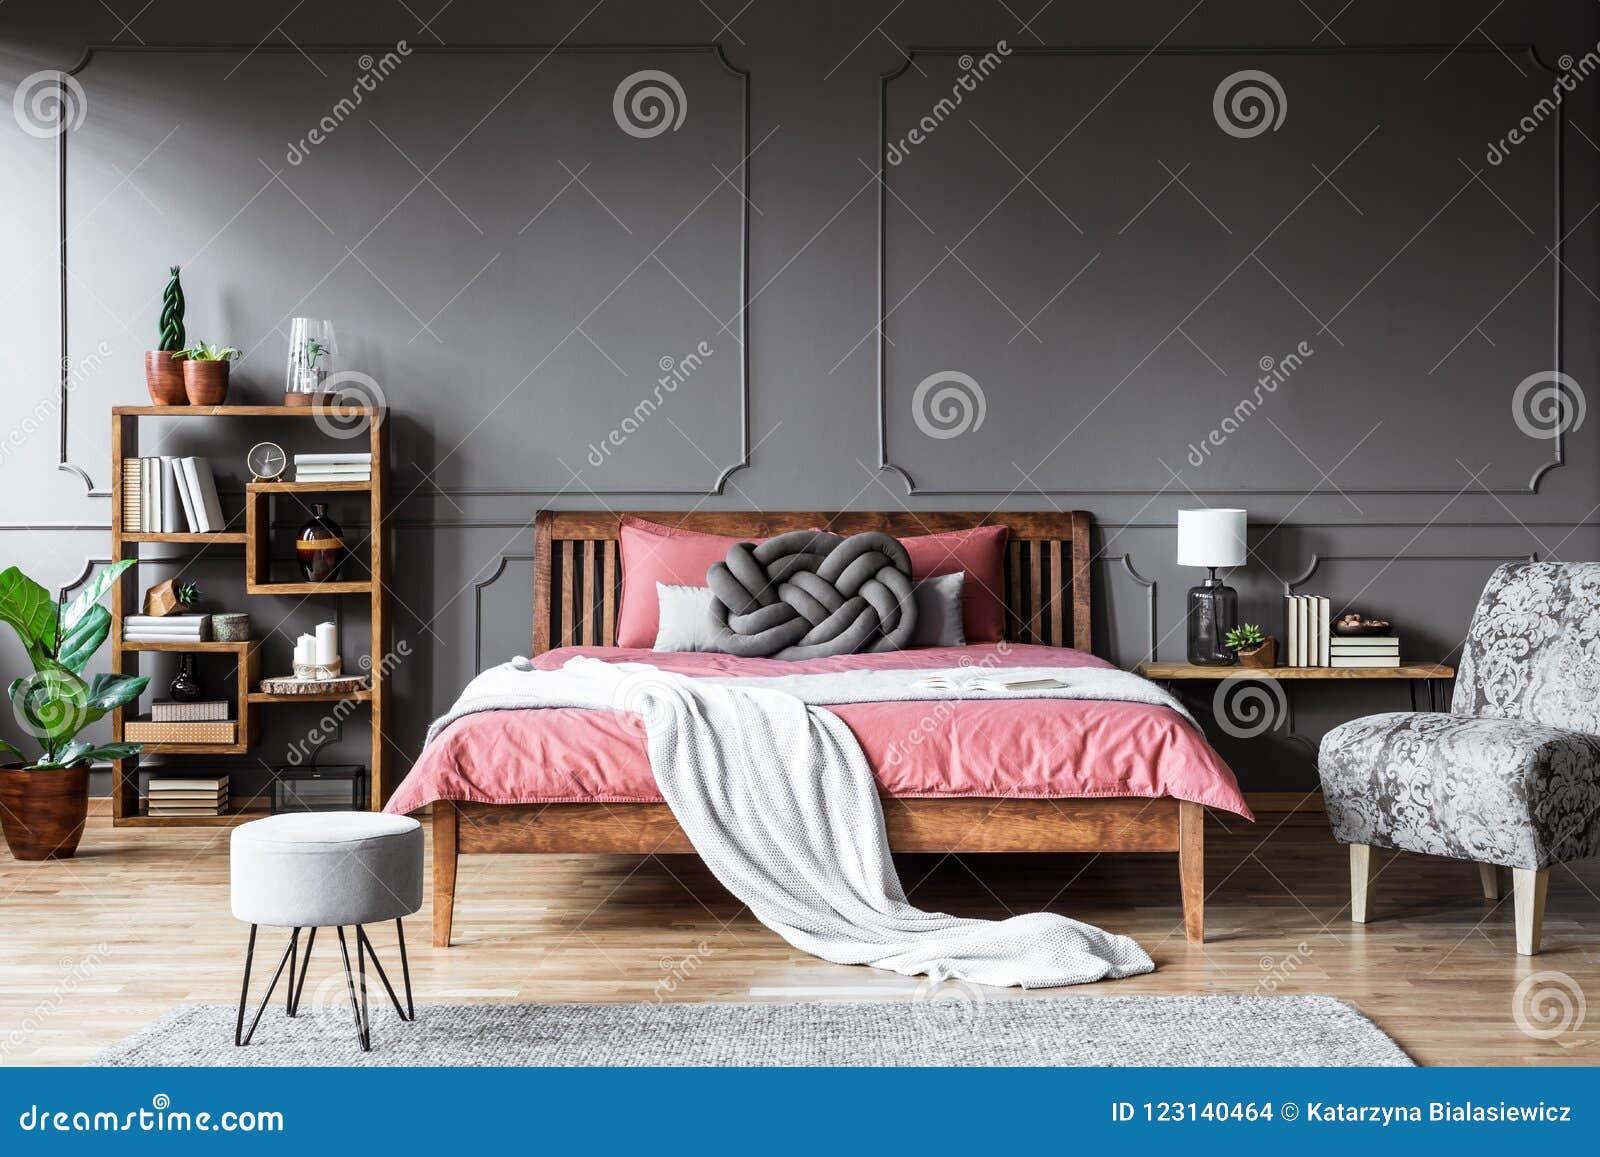 Camera Da Letto Grigia camera da letto grigia e rosa moderna fotografia stock